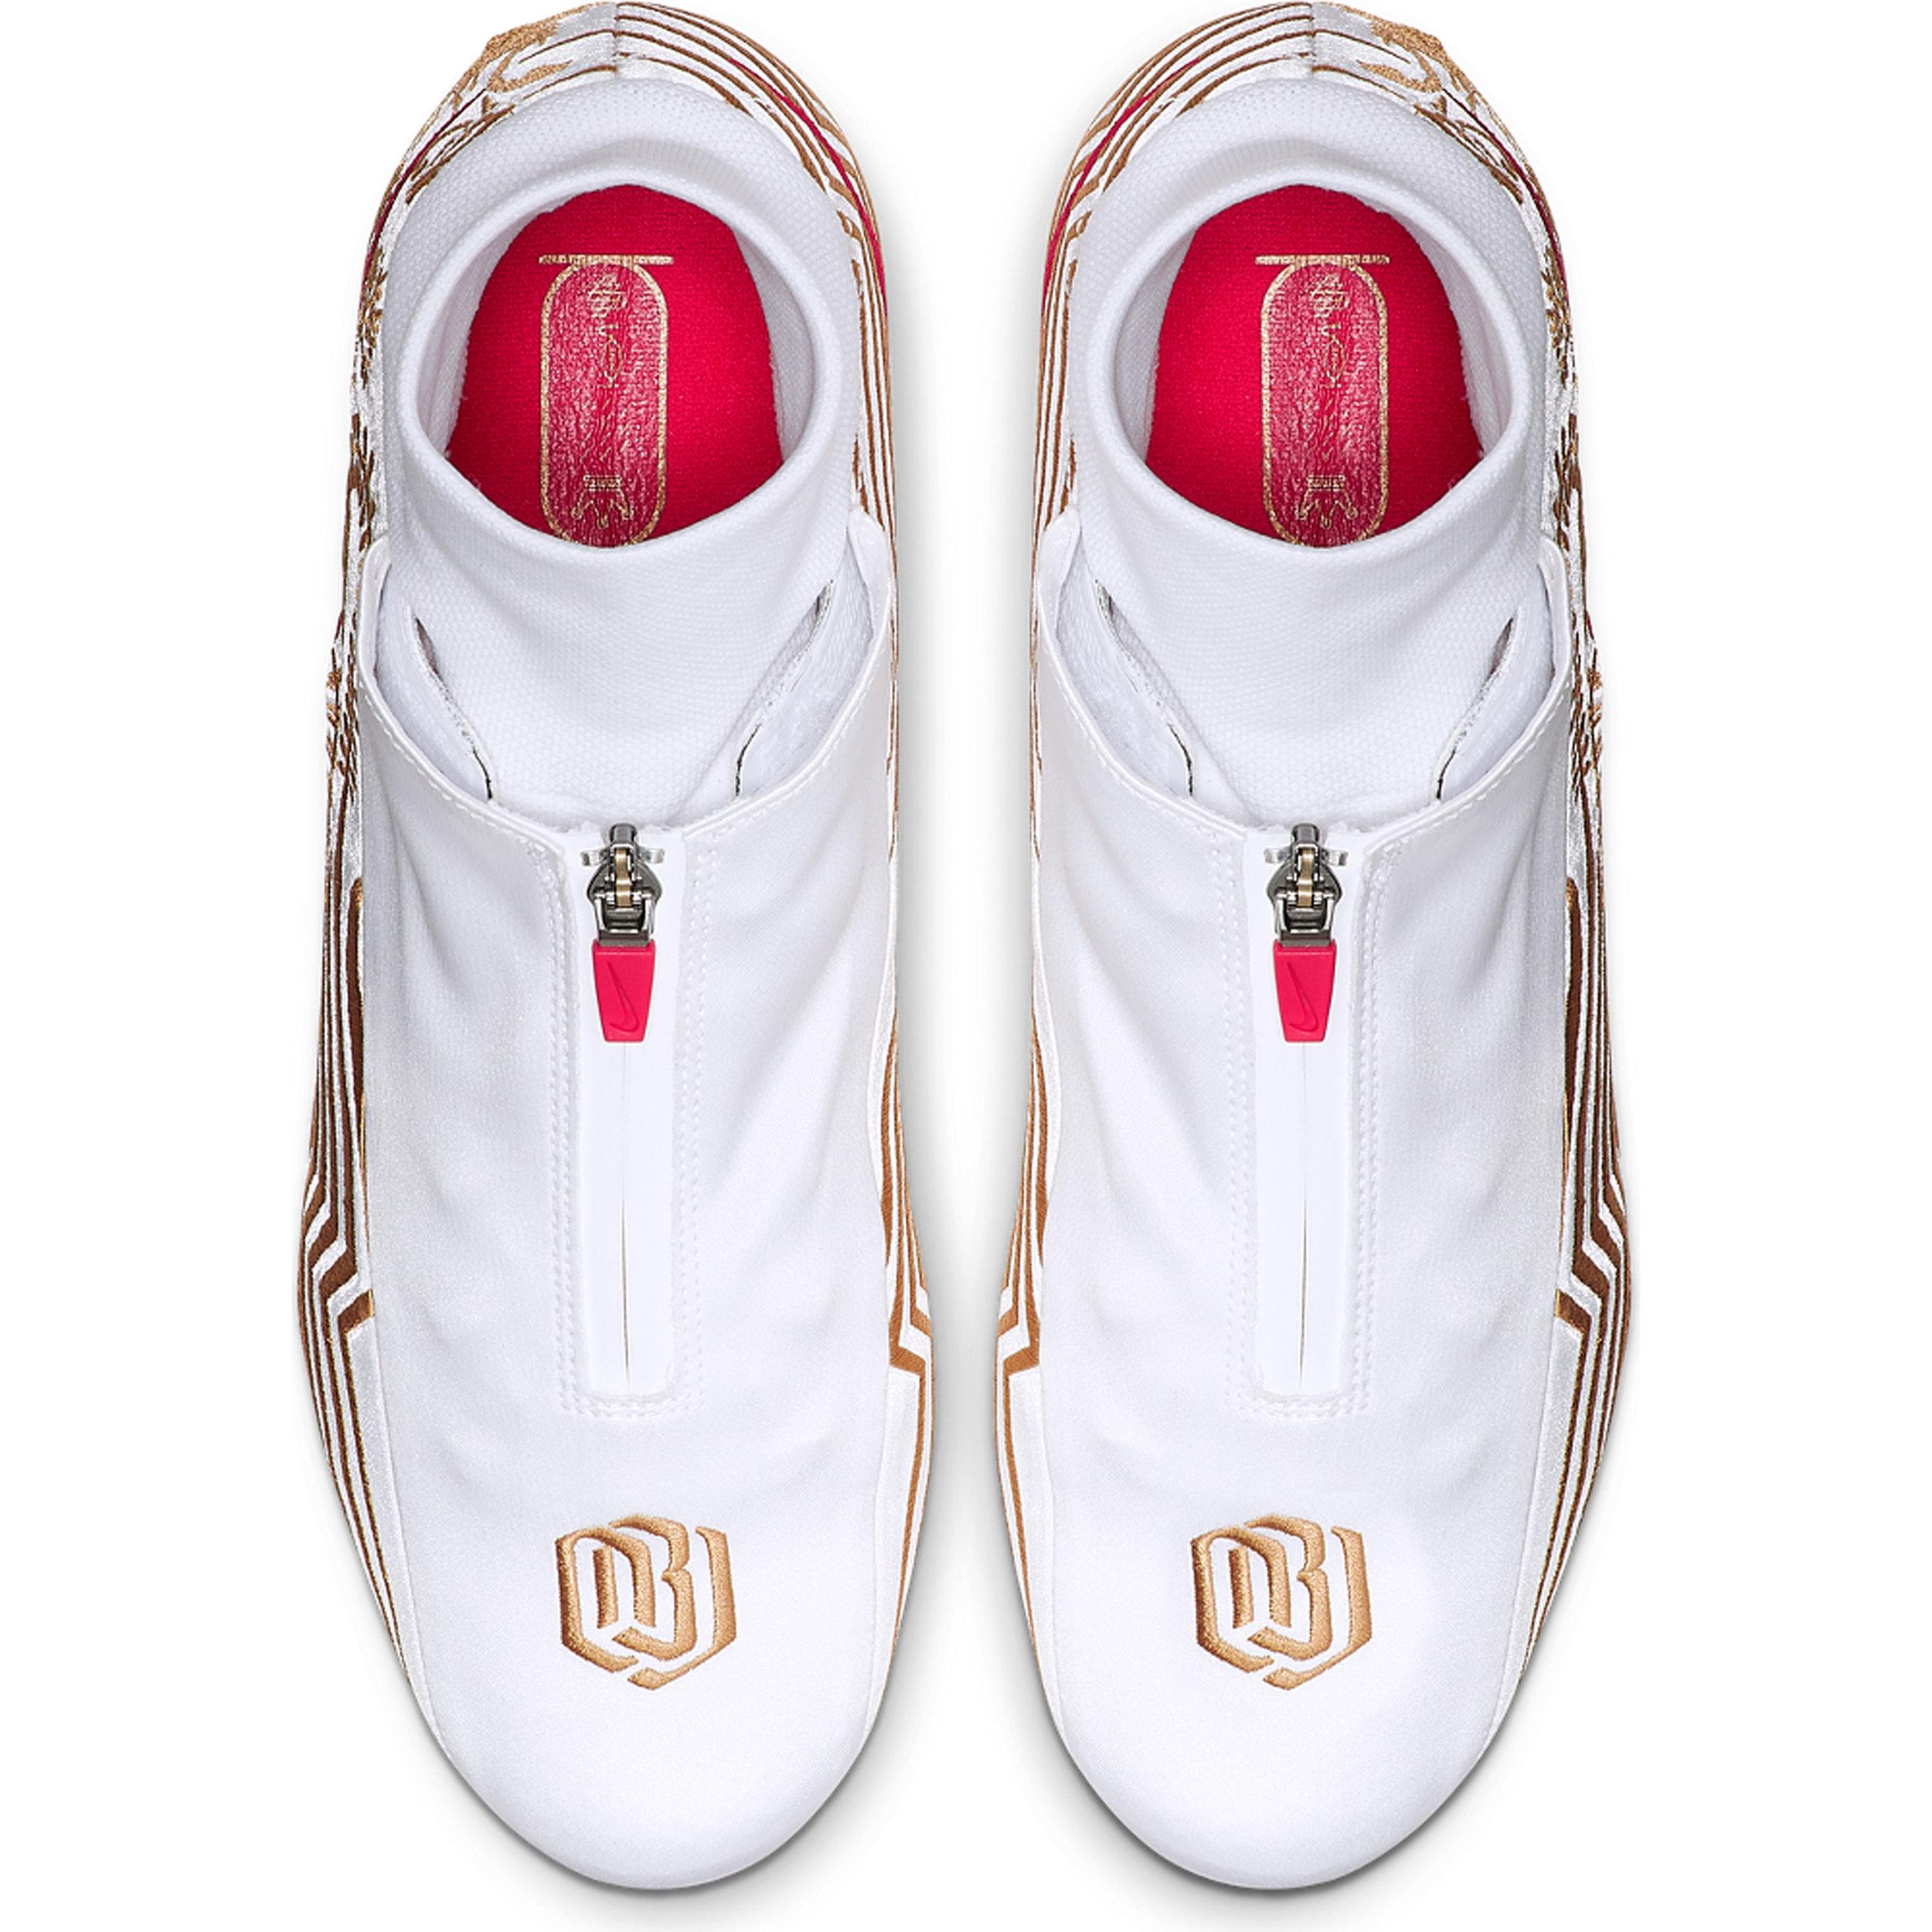 NikeNews_NikeVaporUntouchablePro3_OBJ_03_89287.jpg